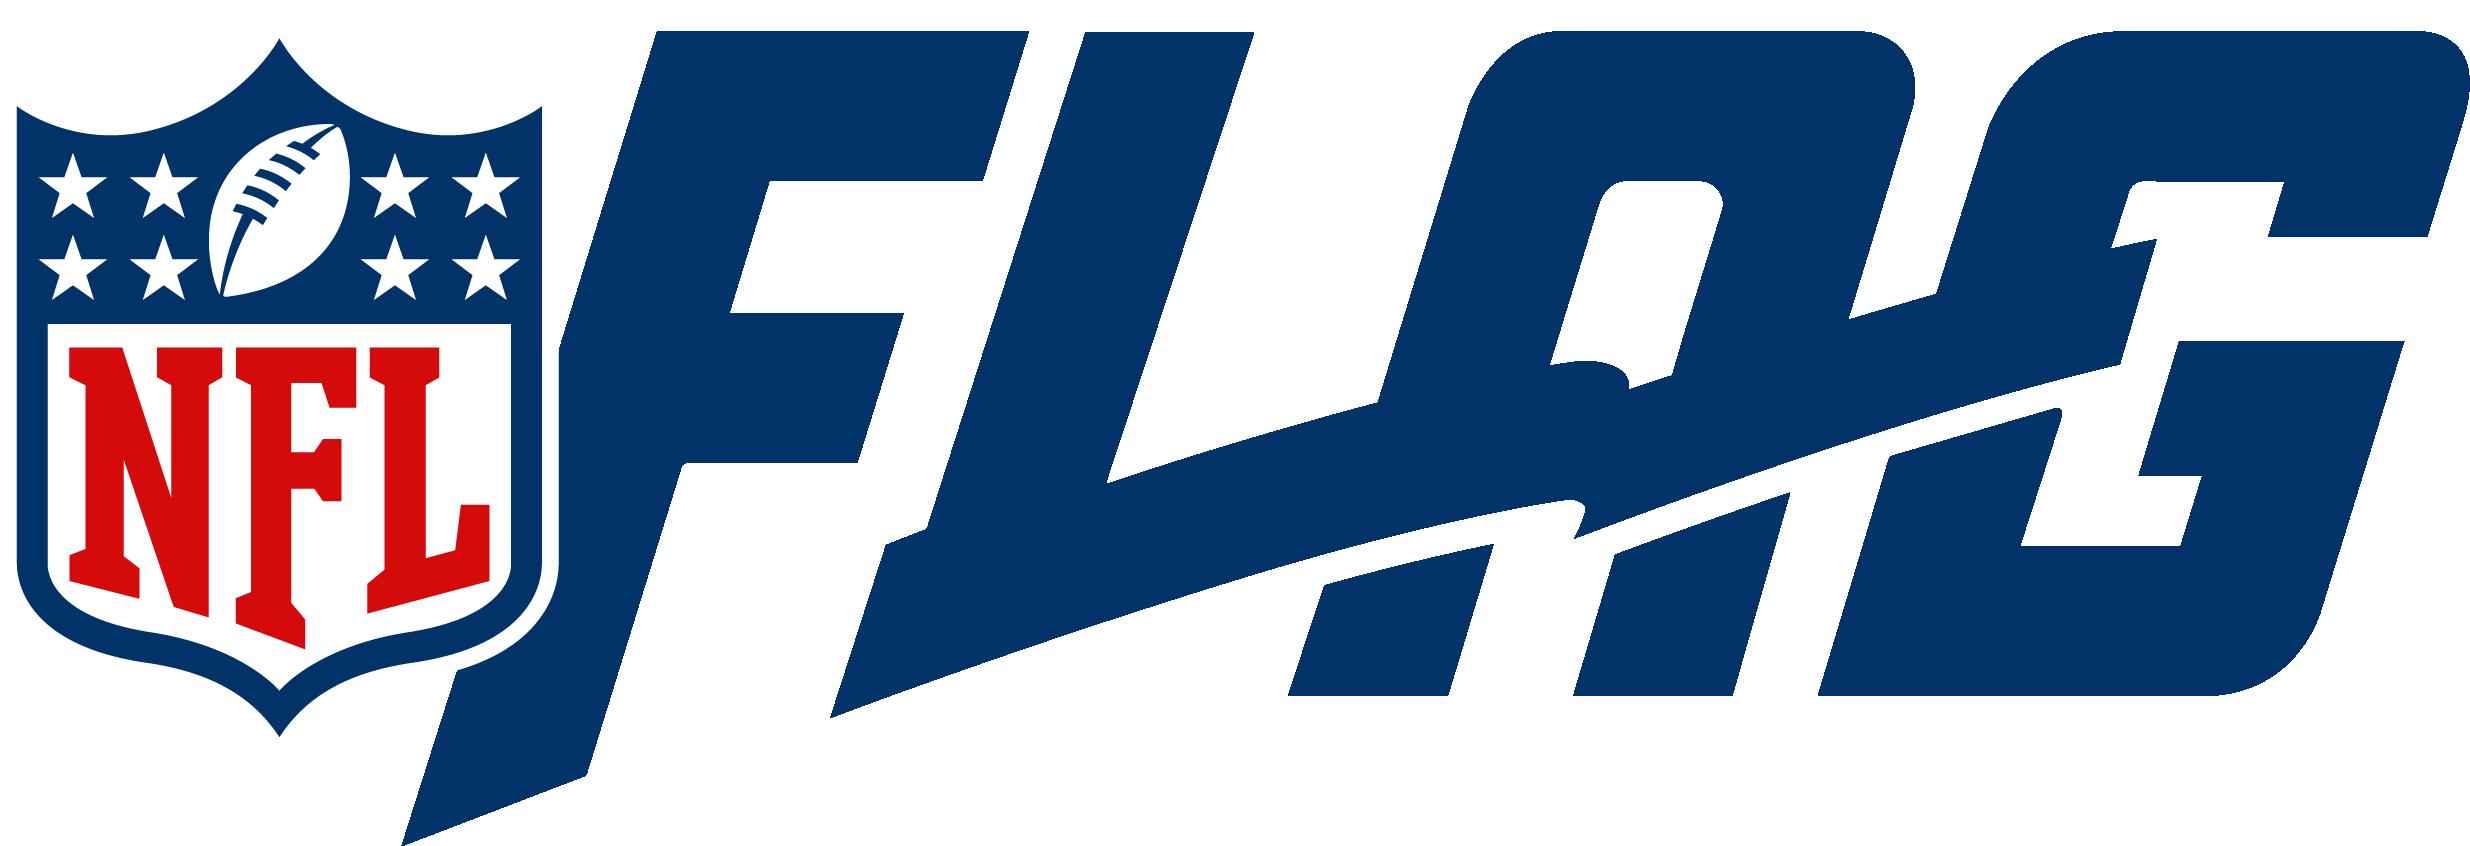 NFL Flag In School Logo